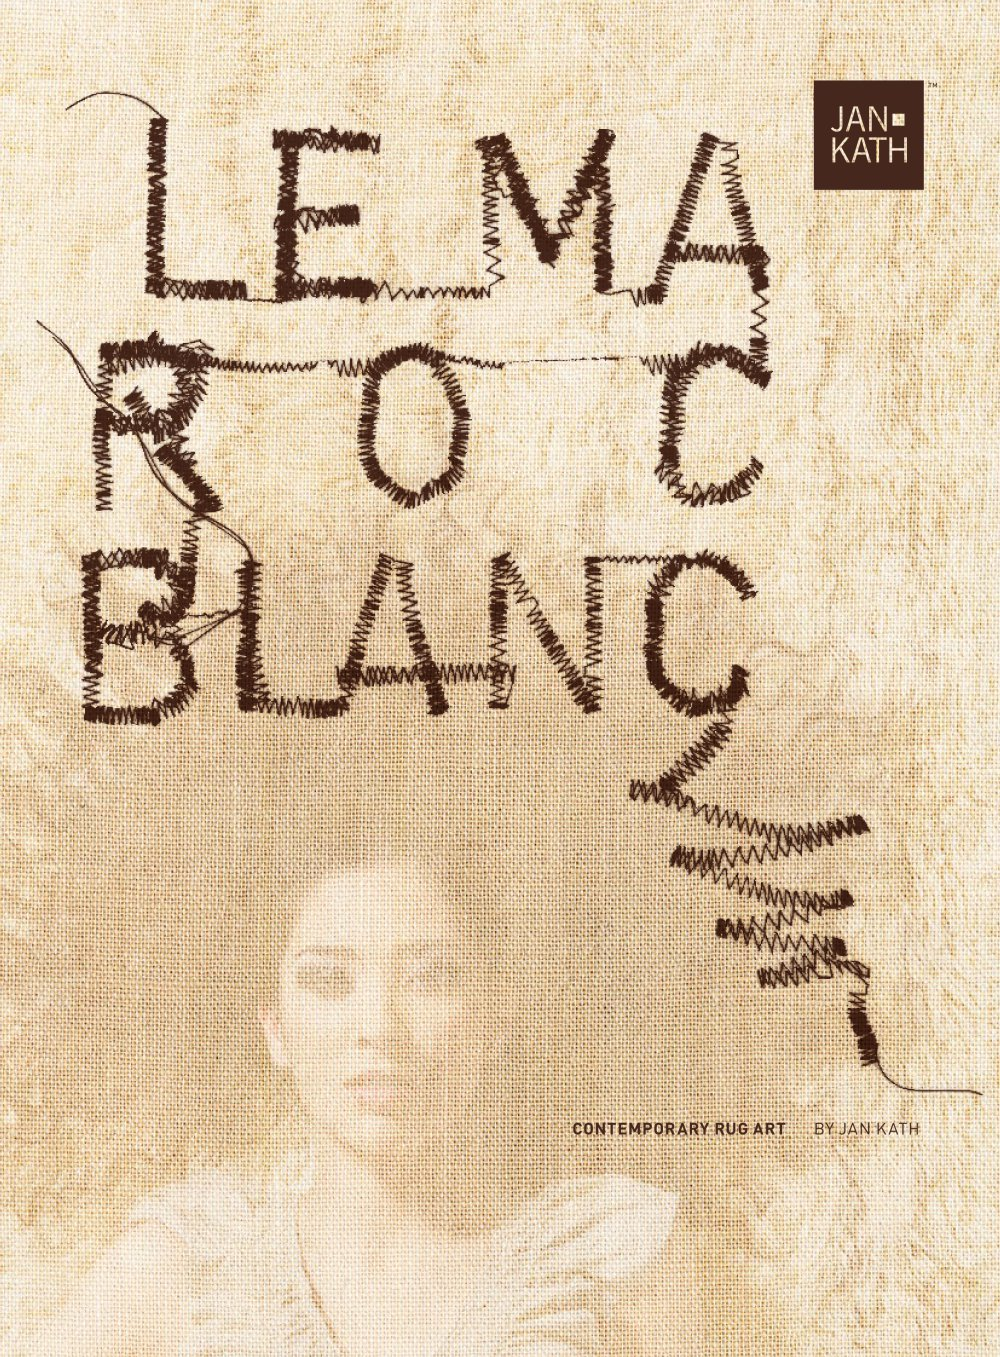 Jan Kath Köln le maroc blanc jan kath contemporary rug pdf catalogues